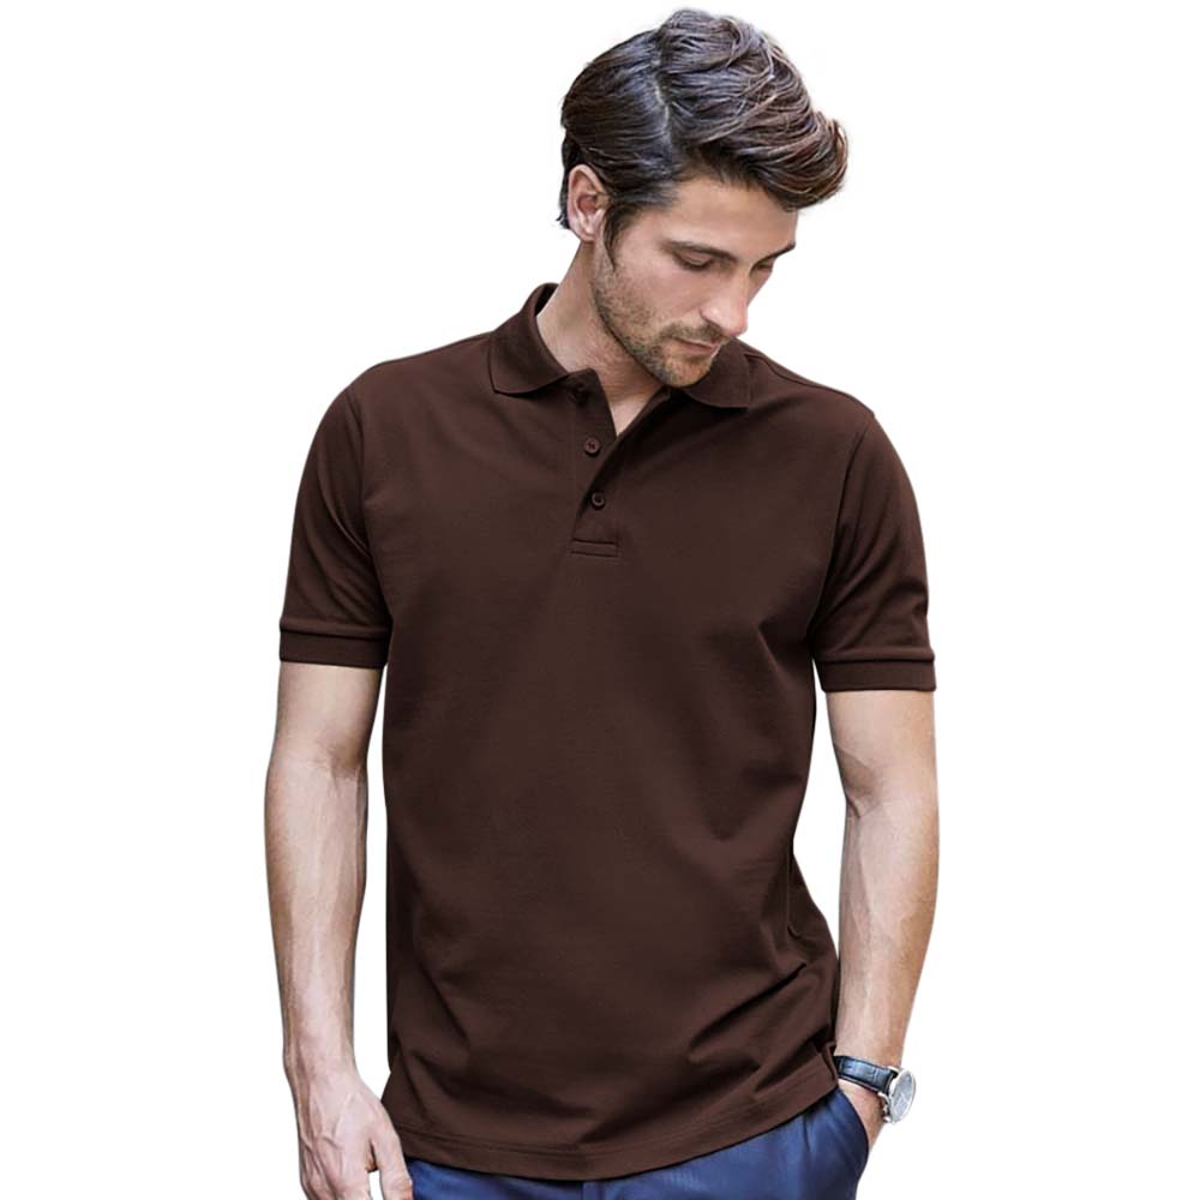 Tee Jays Mens Luxury Stretch Short Sleeve Polo Shirt (L) (Denim)